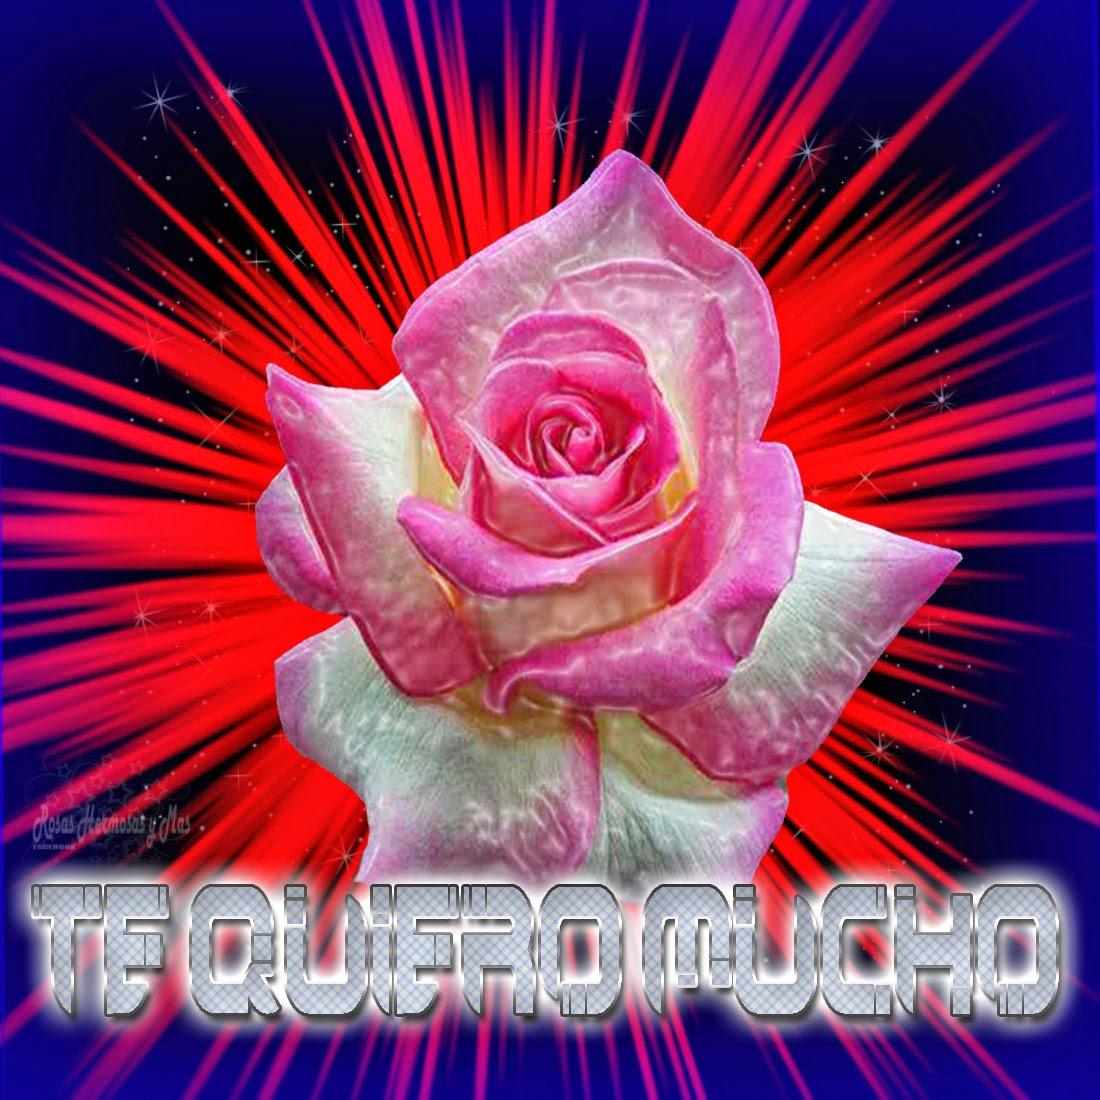 Imagenes De Rosas Rosadas Hermosas - Ramo de rosas rosadas hermosas Dreamstime